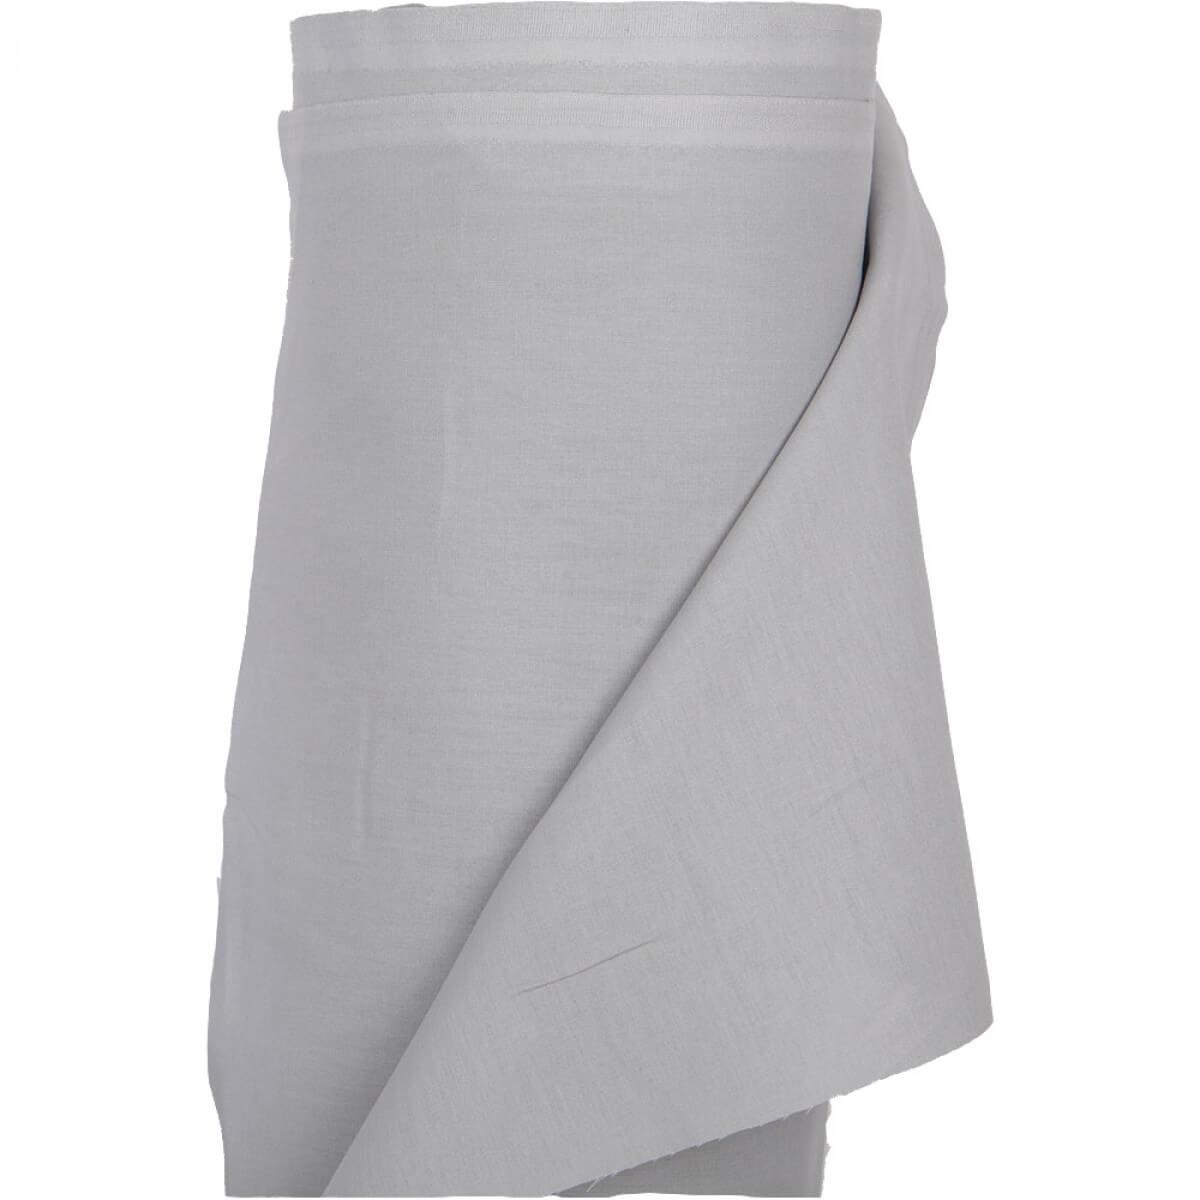 Tissu toile drap 240cm gris merceriecar - Tissu pour drap ...